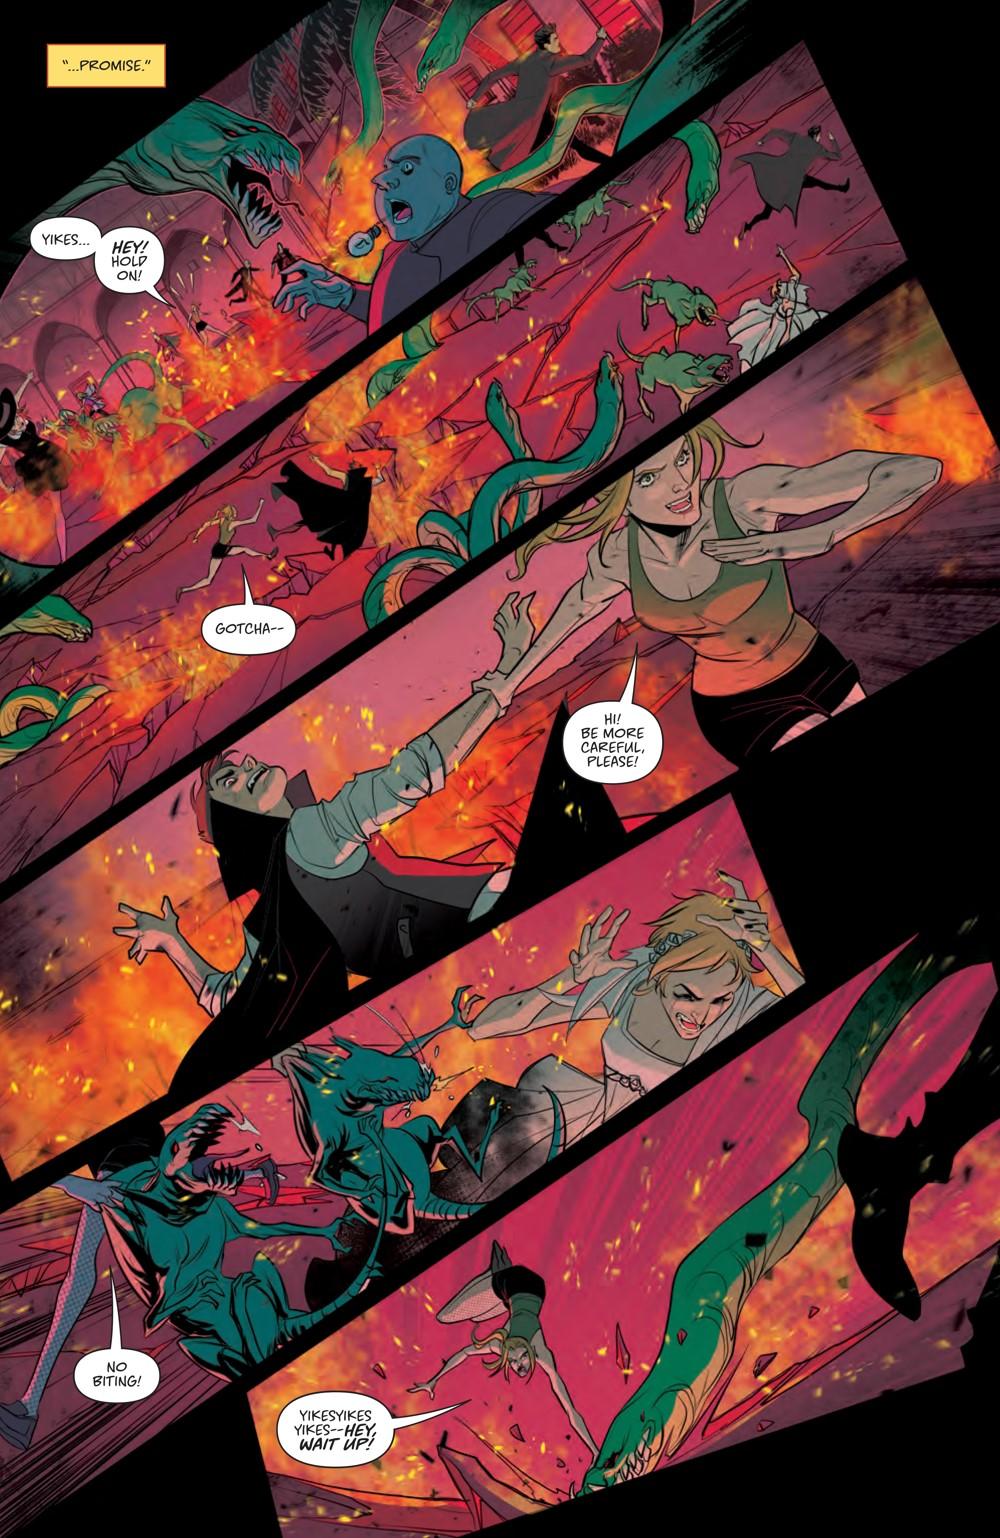 Hellmouth_SC_PRESS_18 ComicList Previews: BUFFY THE VAMPIRE SLAYER HELLMOUTH TP